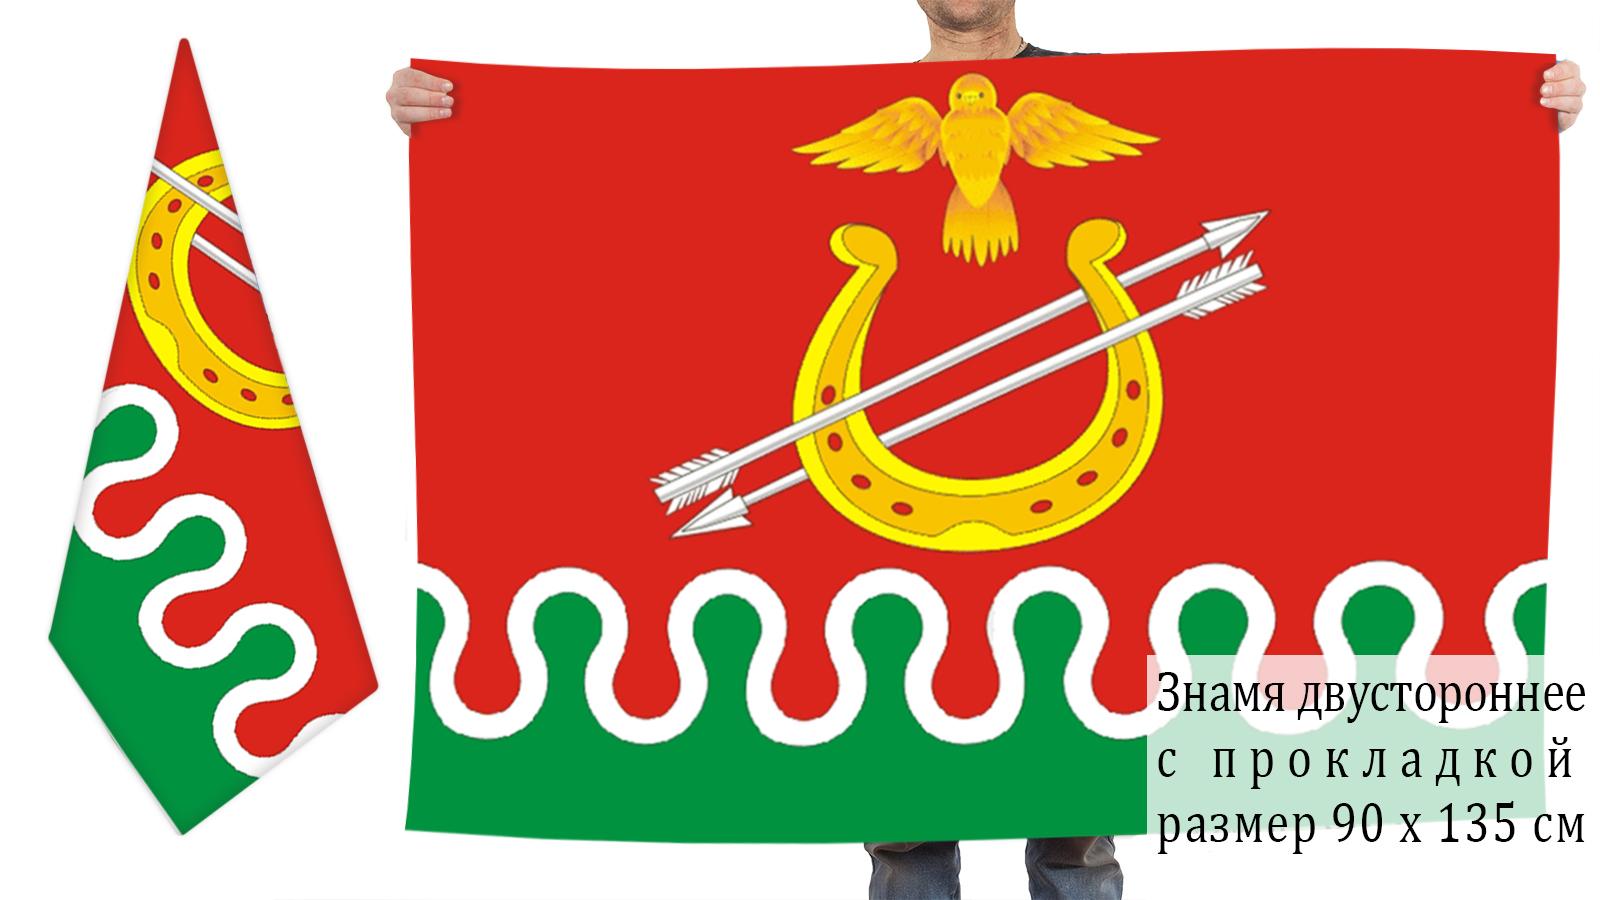 Двусторонний флаг Боготольского района Красноярского края